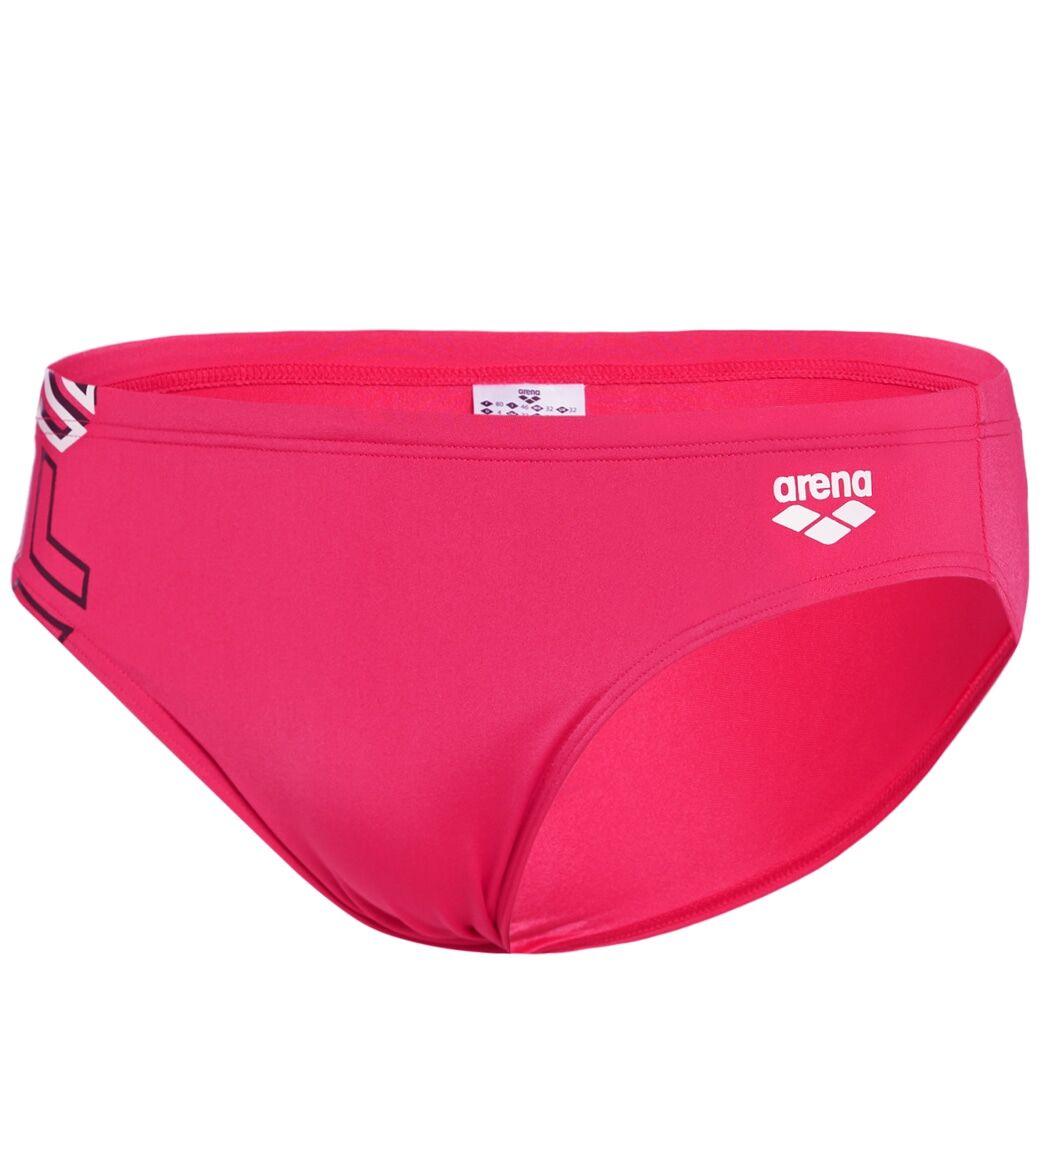 Arena Men's Pink Kikko Brief Swimsuit - Freak Rose 24 - Swimoutlet.com